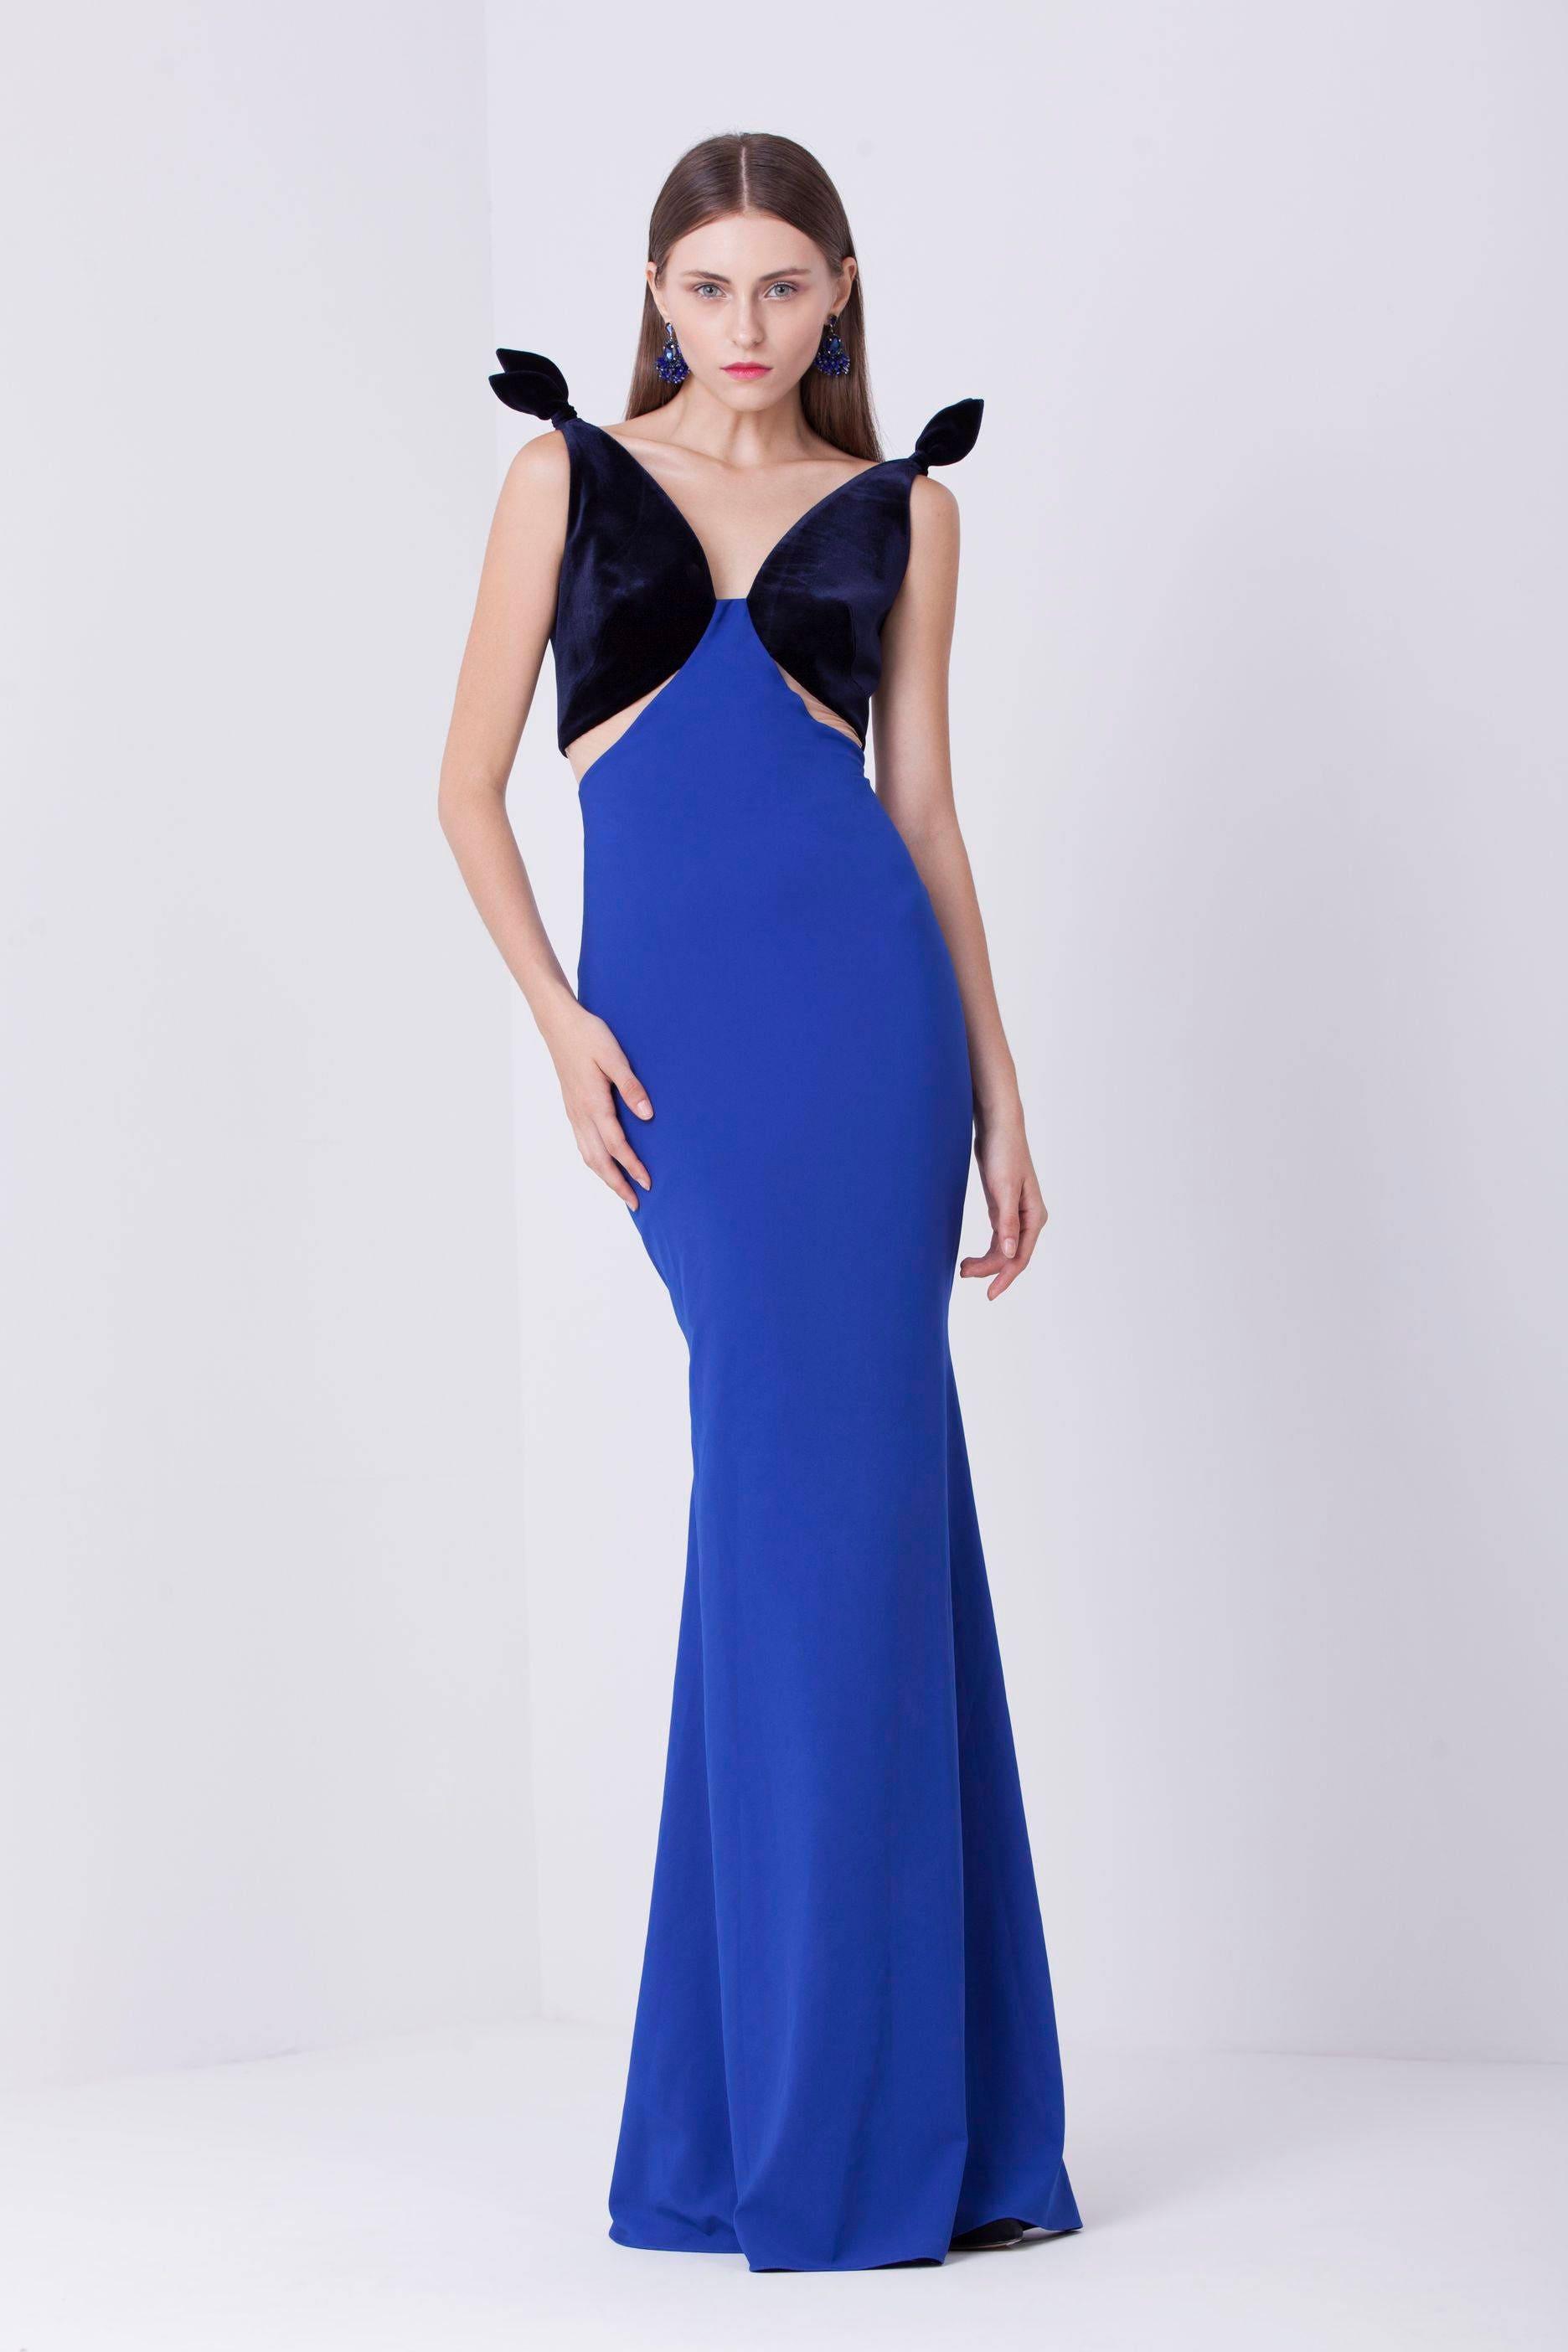 Blue evening dress wedding guest dress special occasion